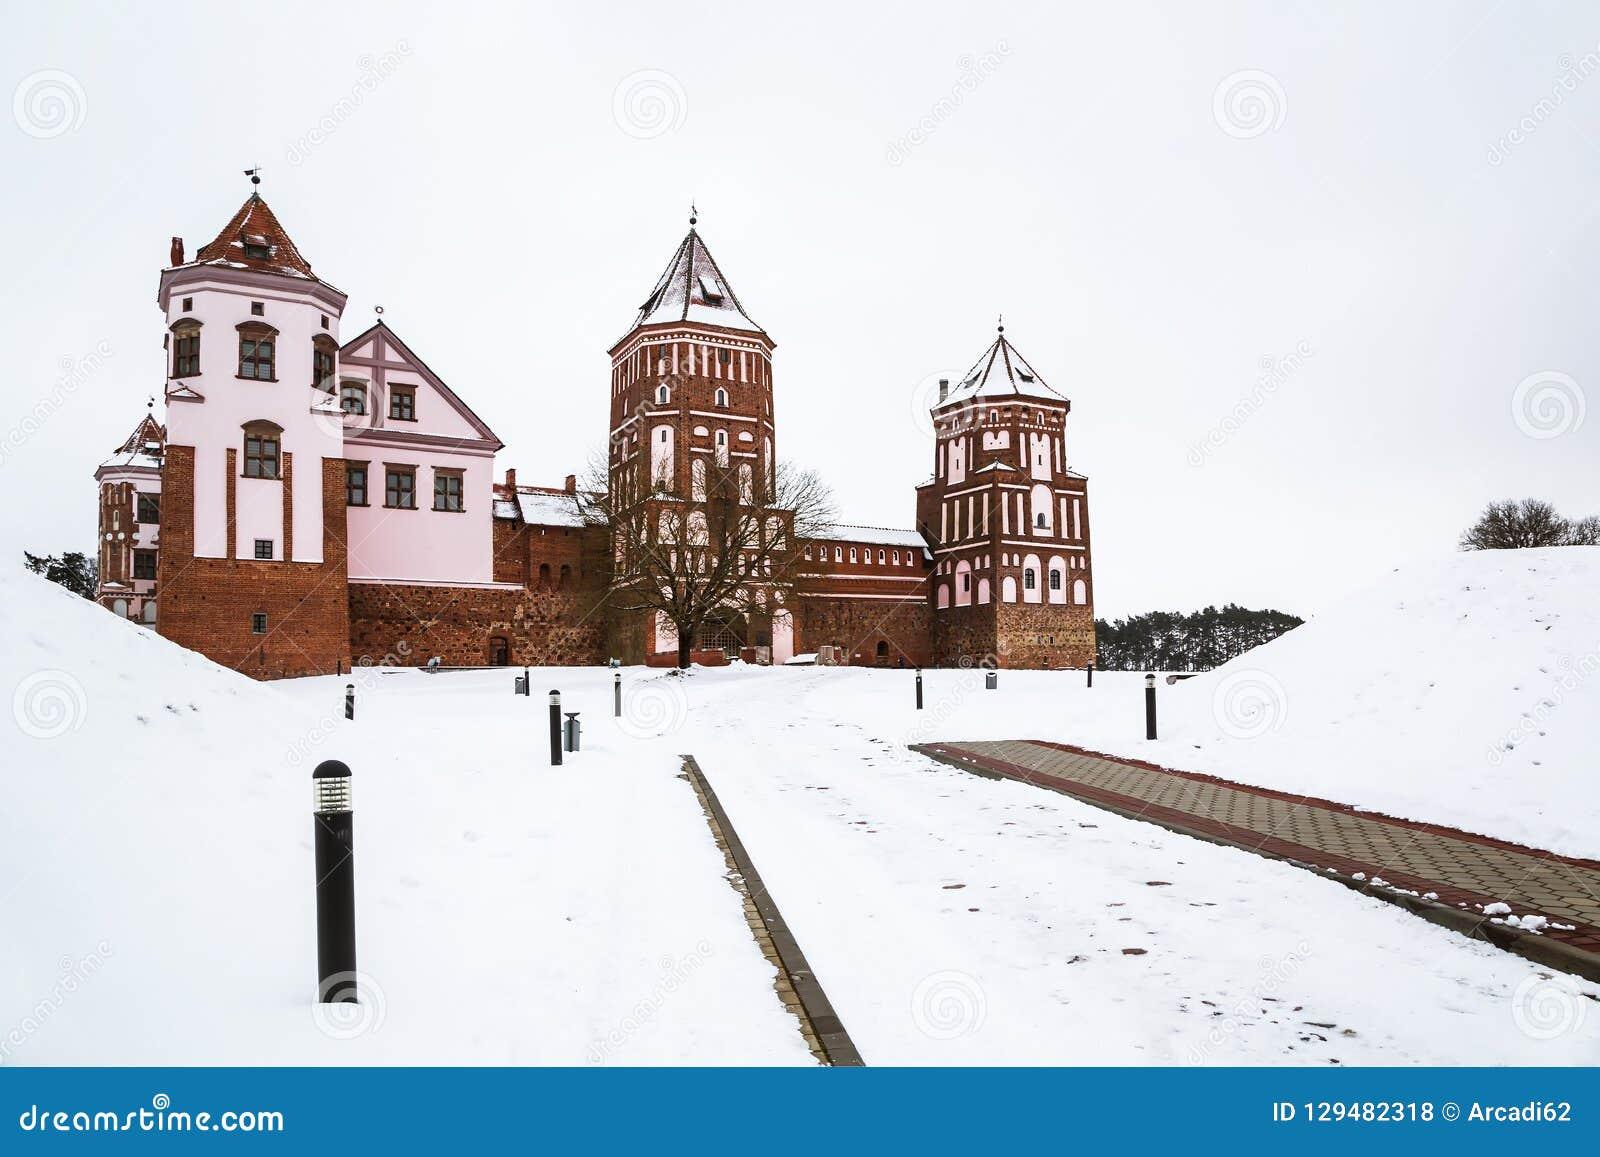 The Mir Castle. winter